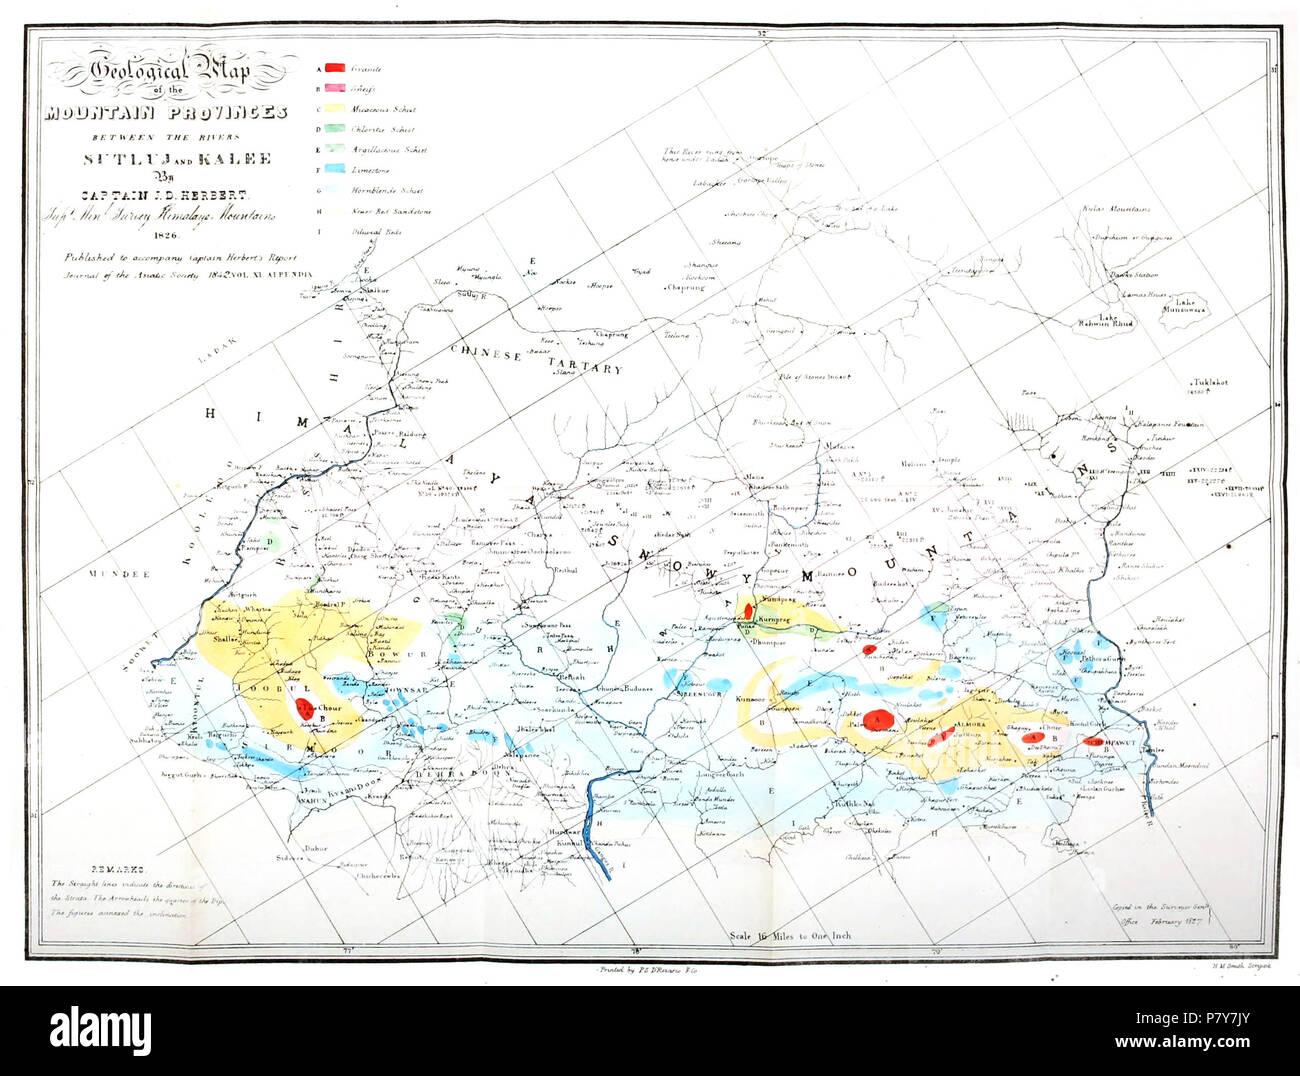 Geological Map Of India.Geological Map Of India Stock Photos Geological Map Of India Stock